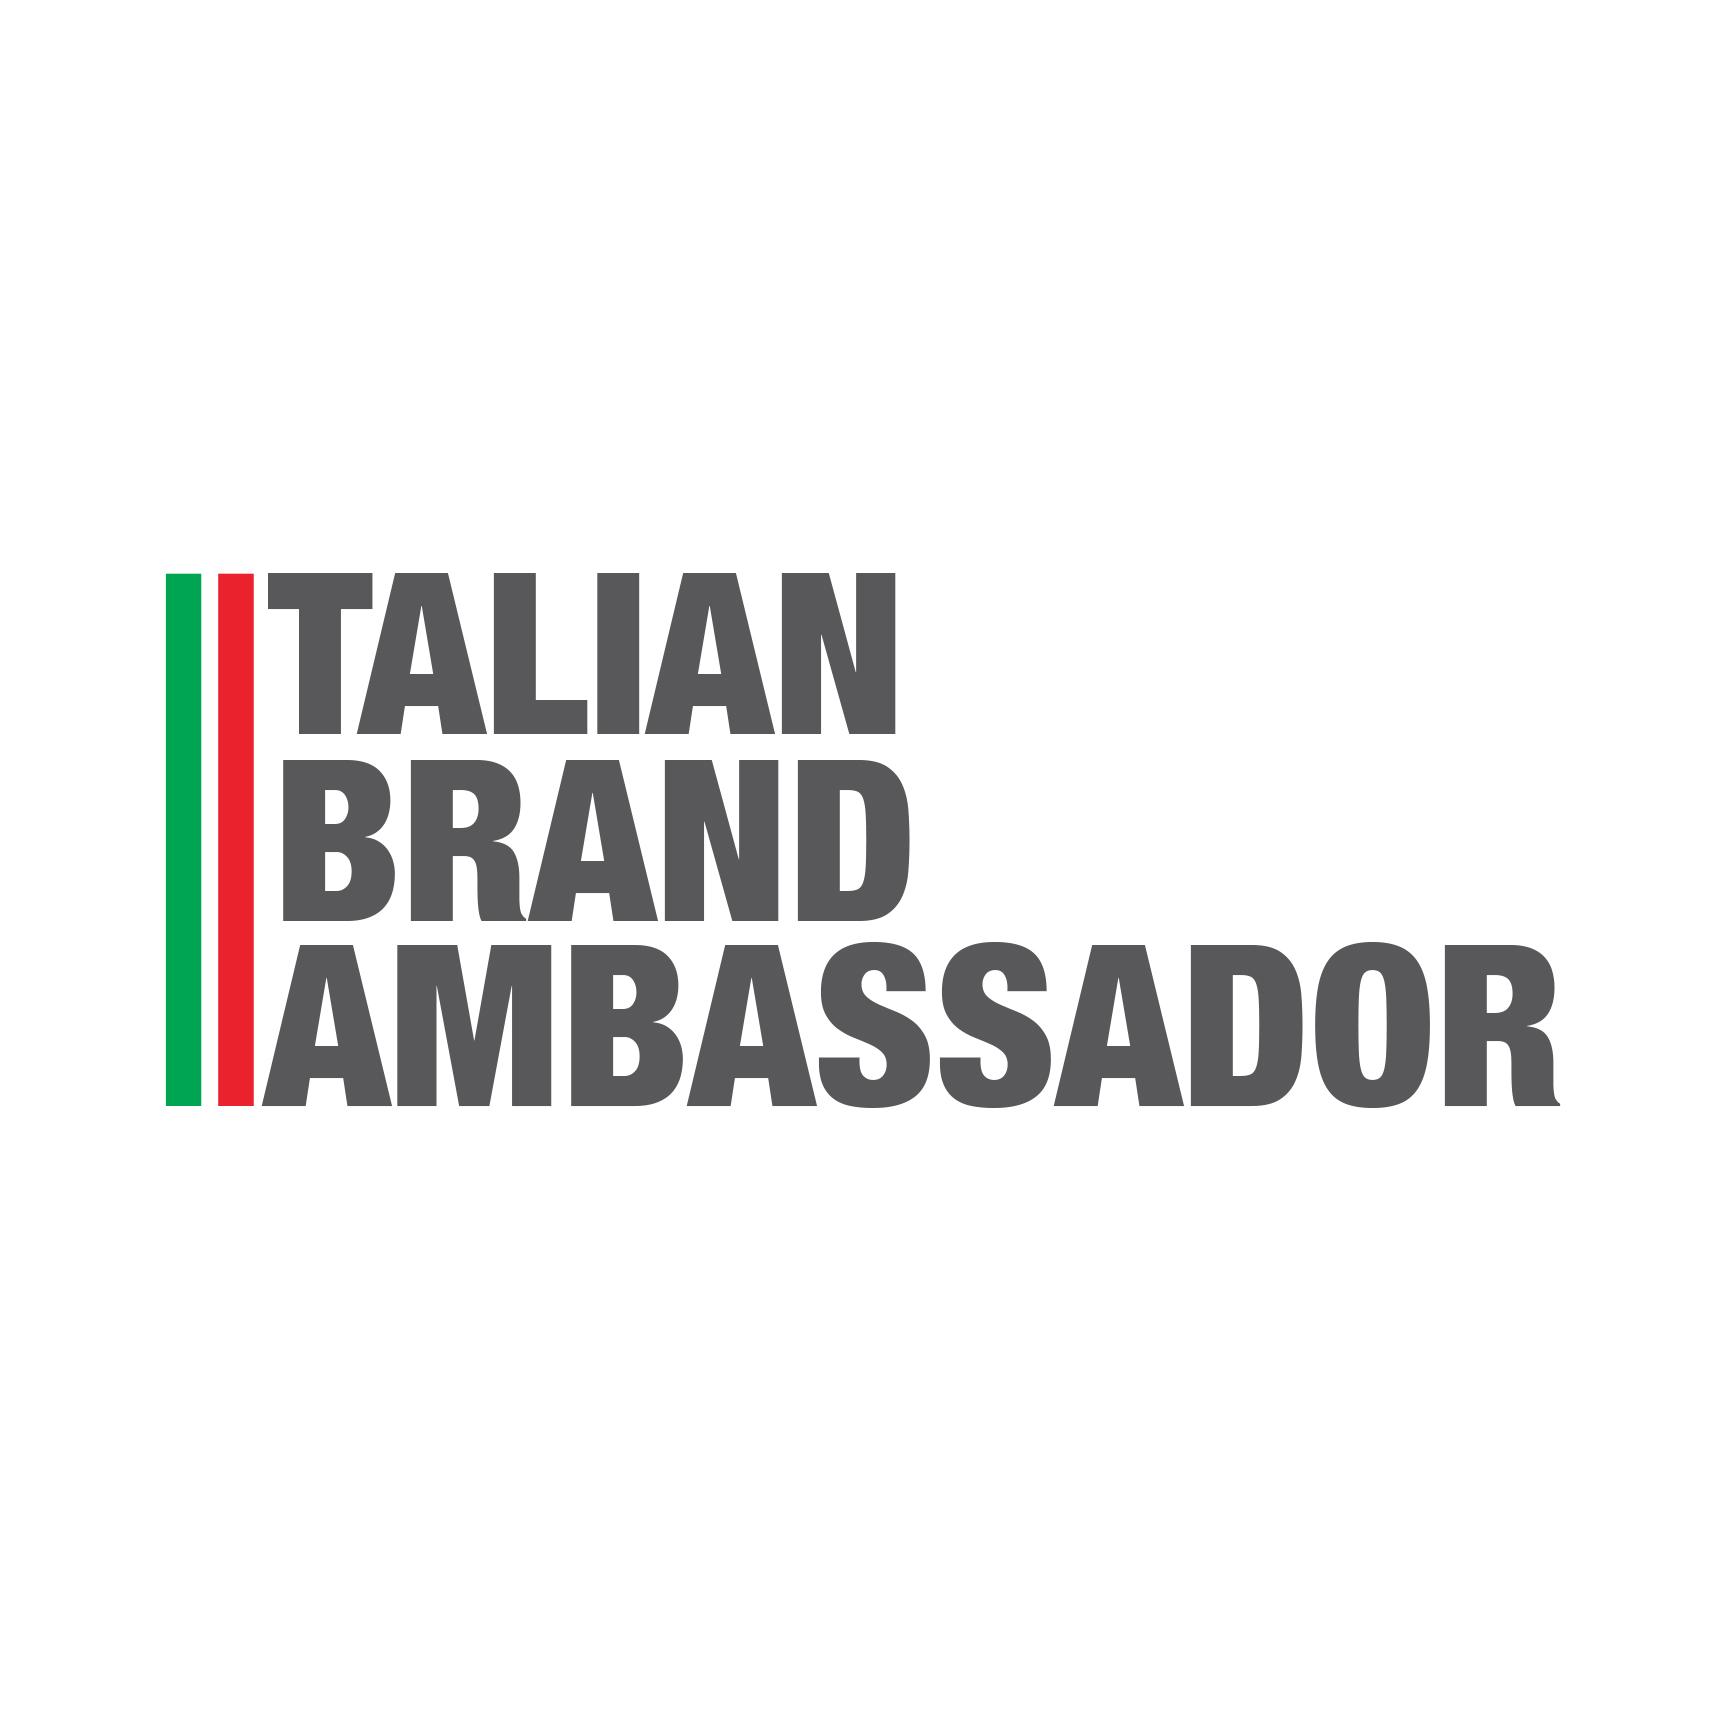 Italian Brand Ambassador